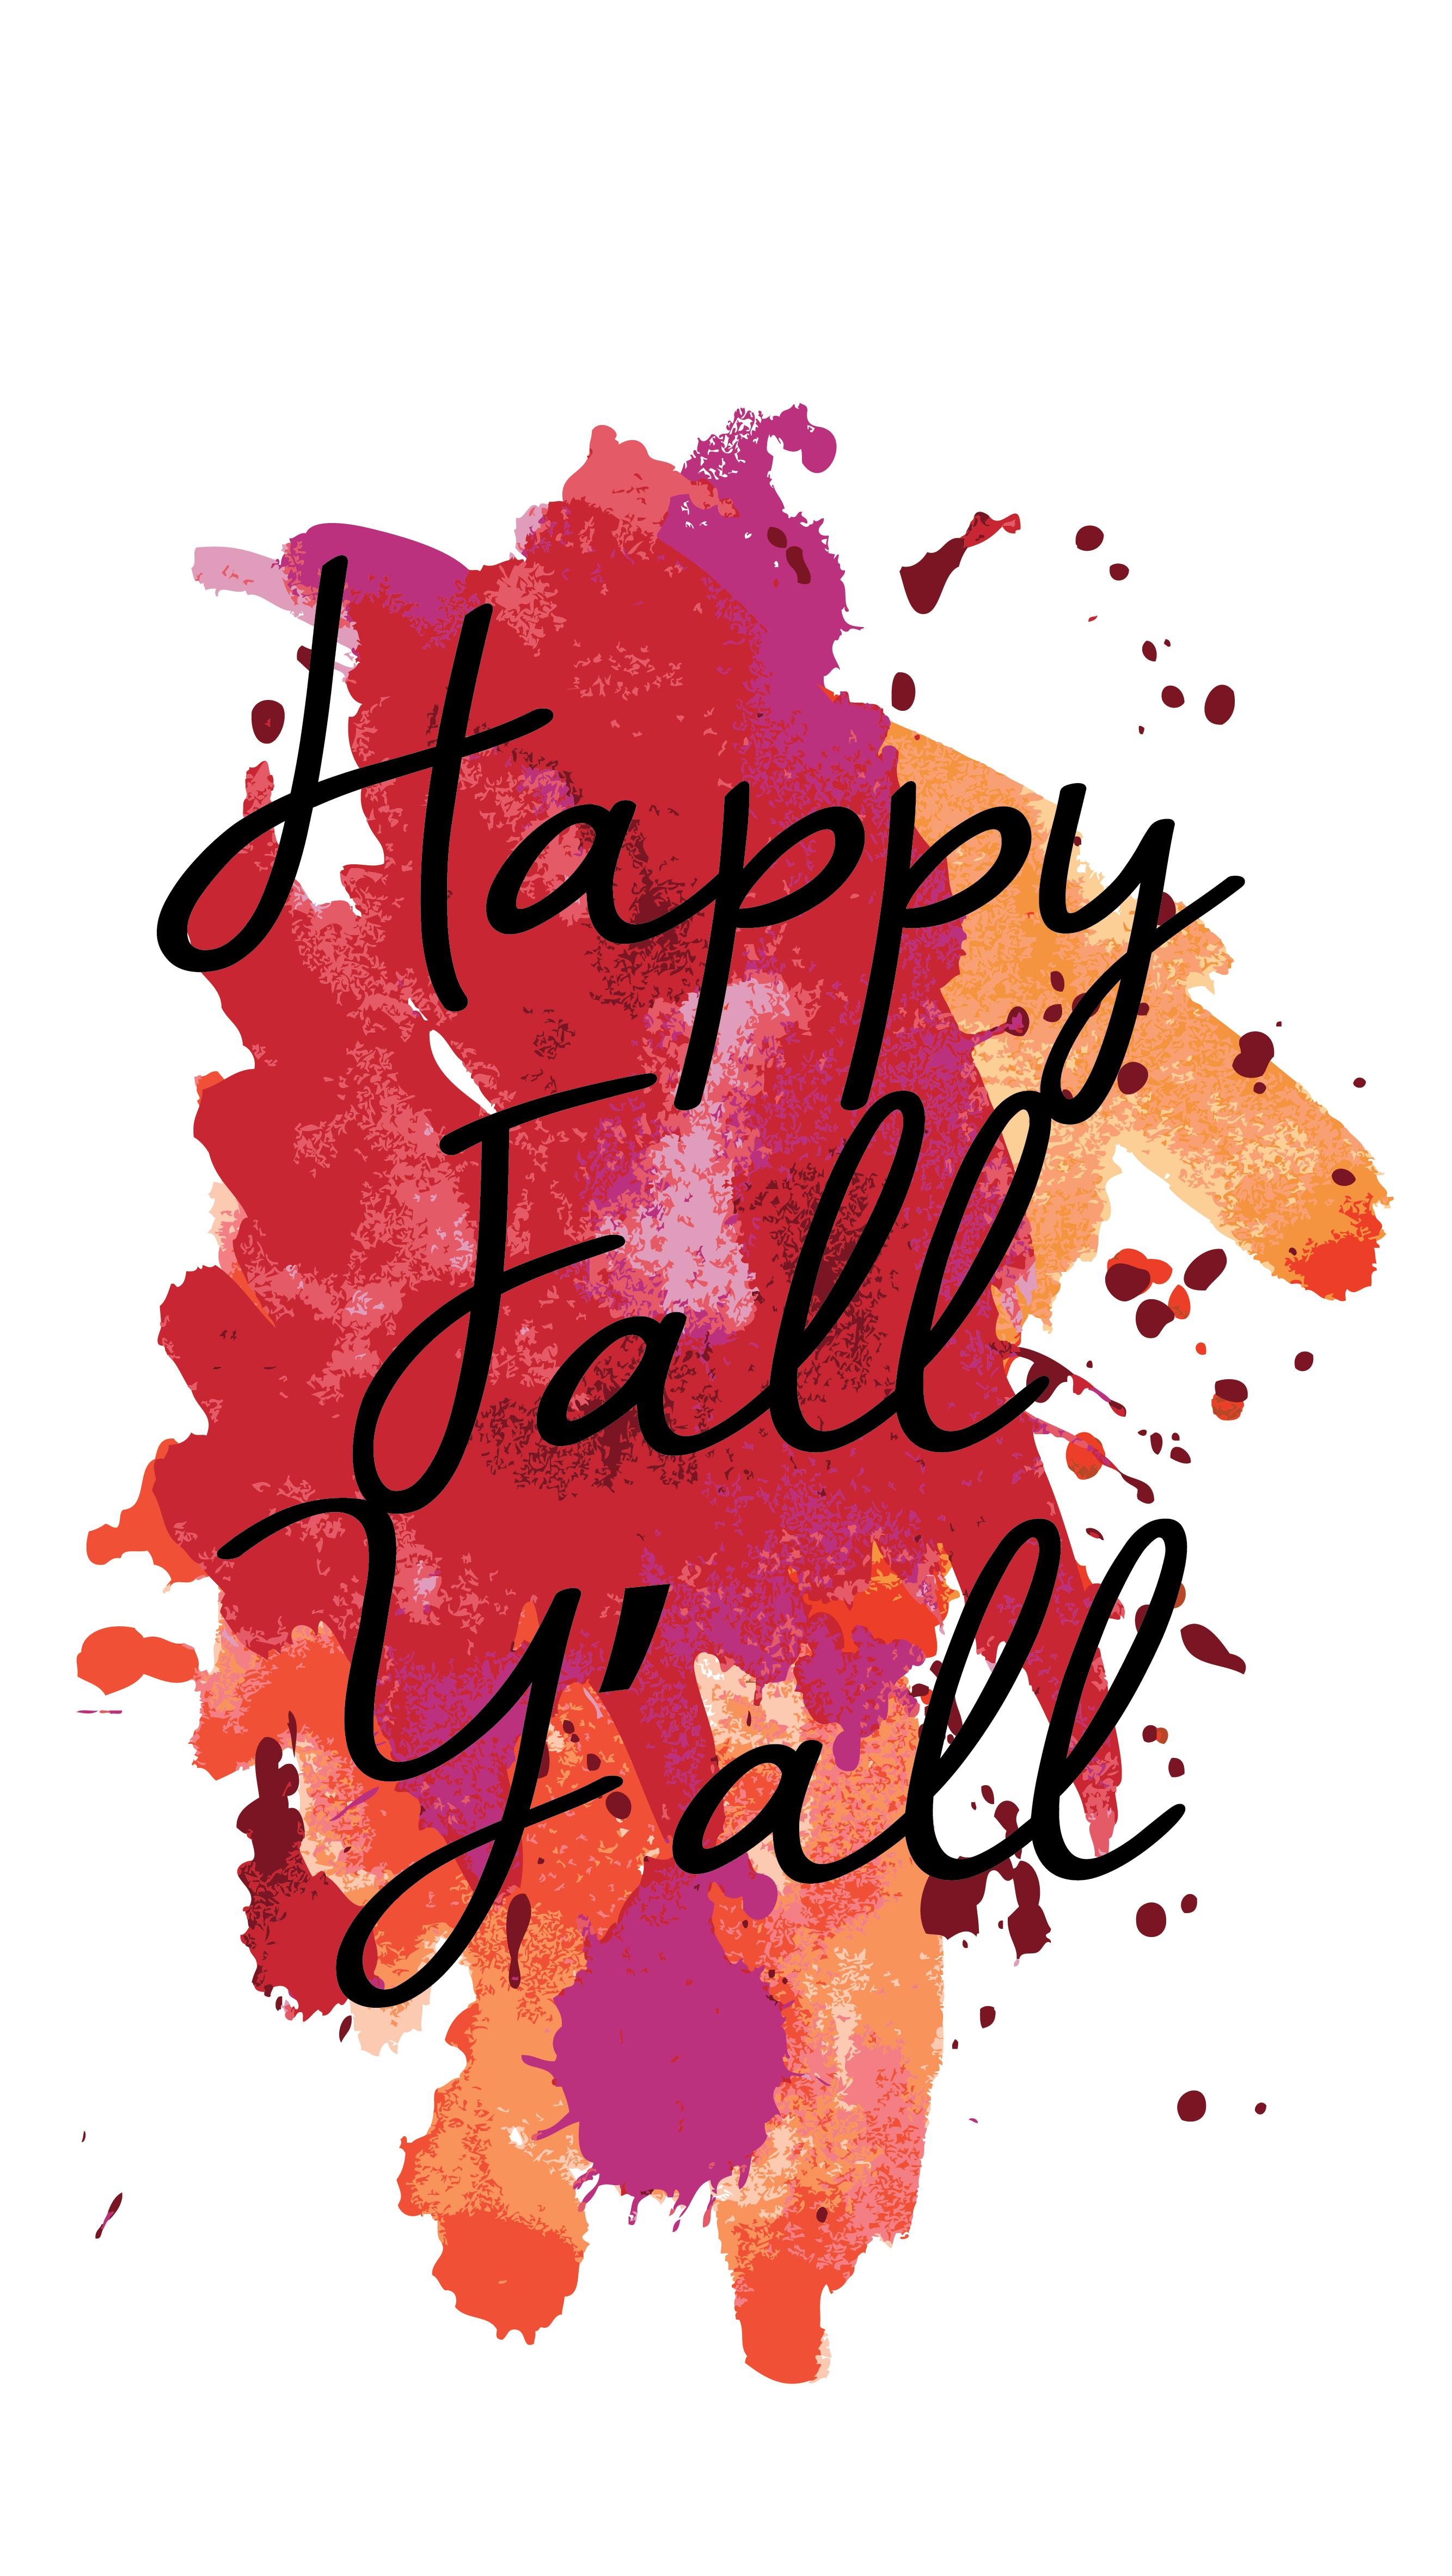 Fallbackground1 - Cute Fall Wallpaper Phone - 2667x4733 ...